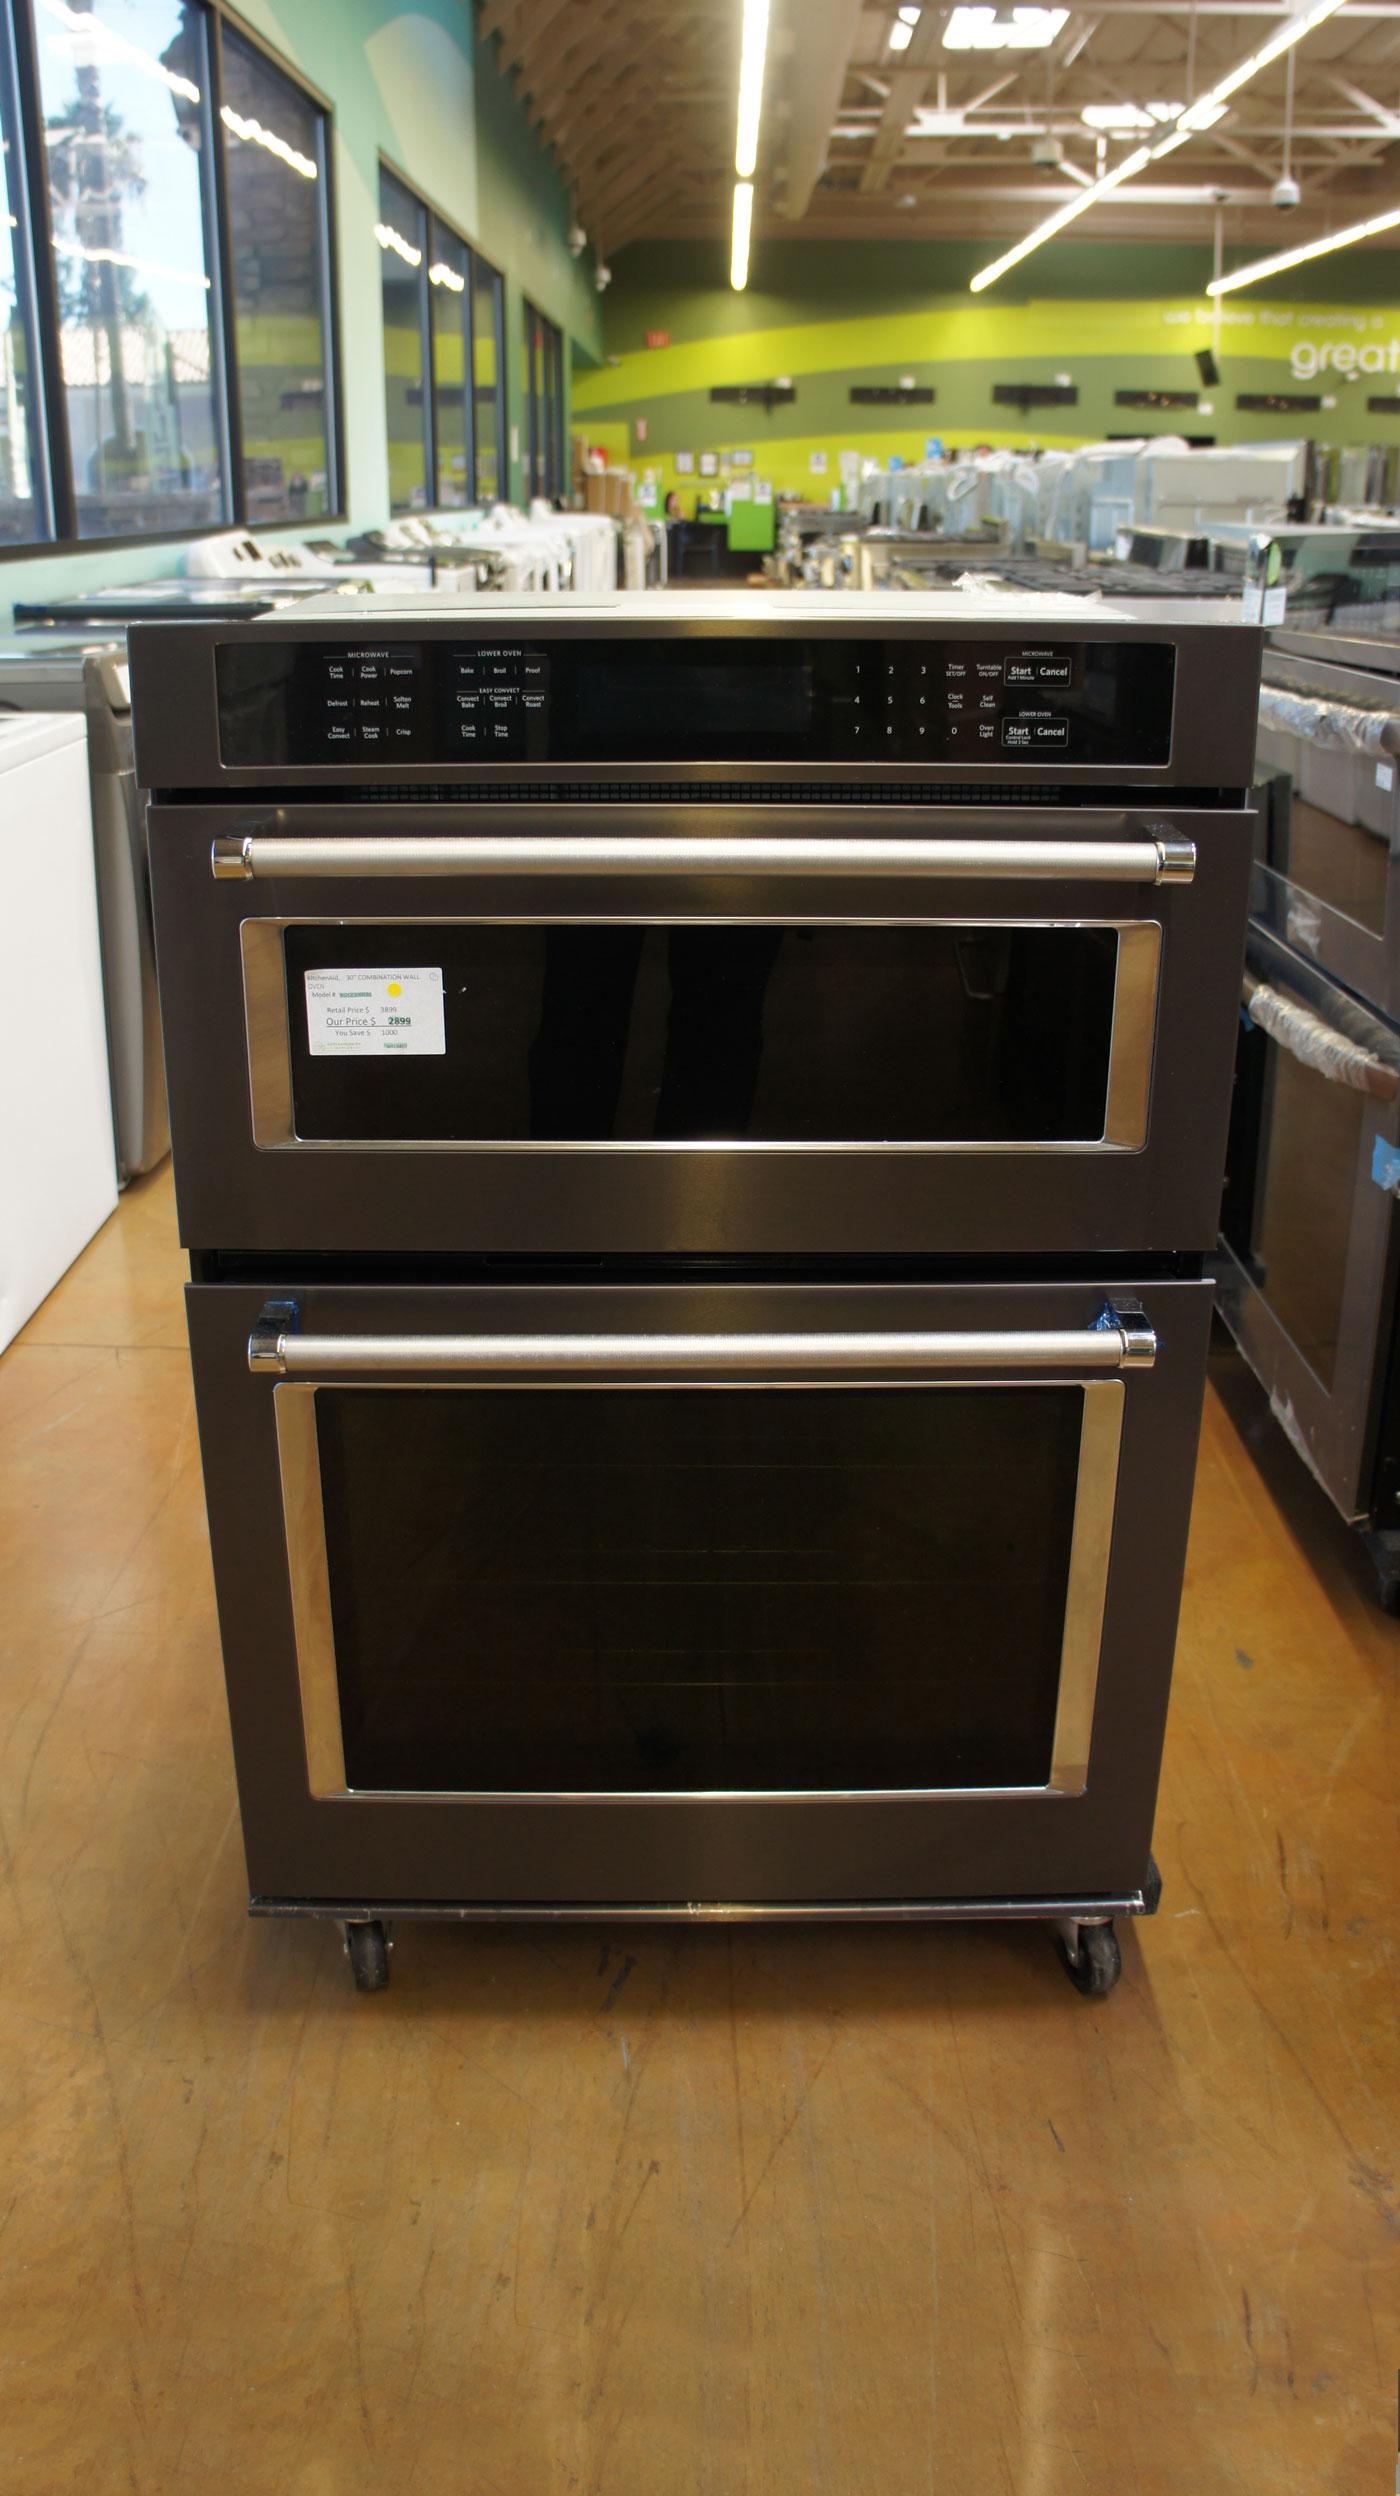 KitchenAid KOCE500EBS Combination Wall Oven